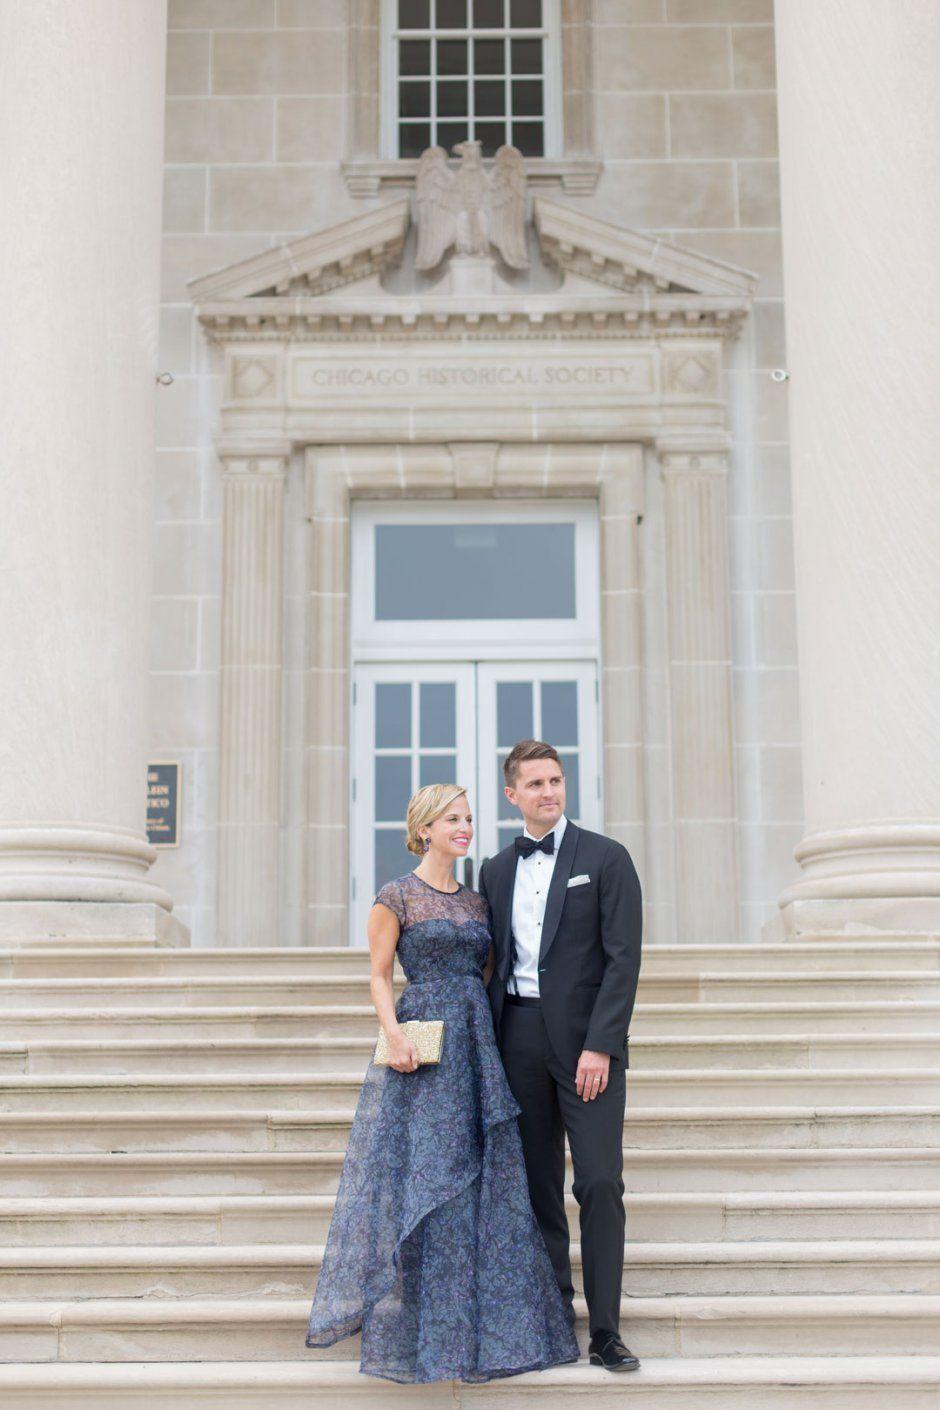 5e9ed3ac62 Classic Black Tie Wedding Attire for Men and Women    Wedding Style     Photo by Jennifer Kathryn Photography